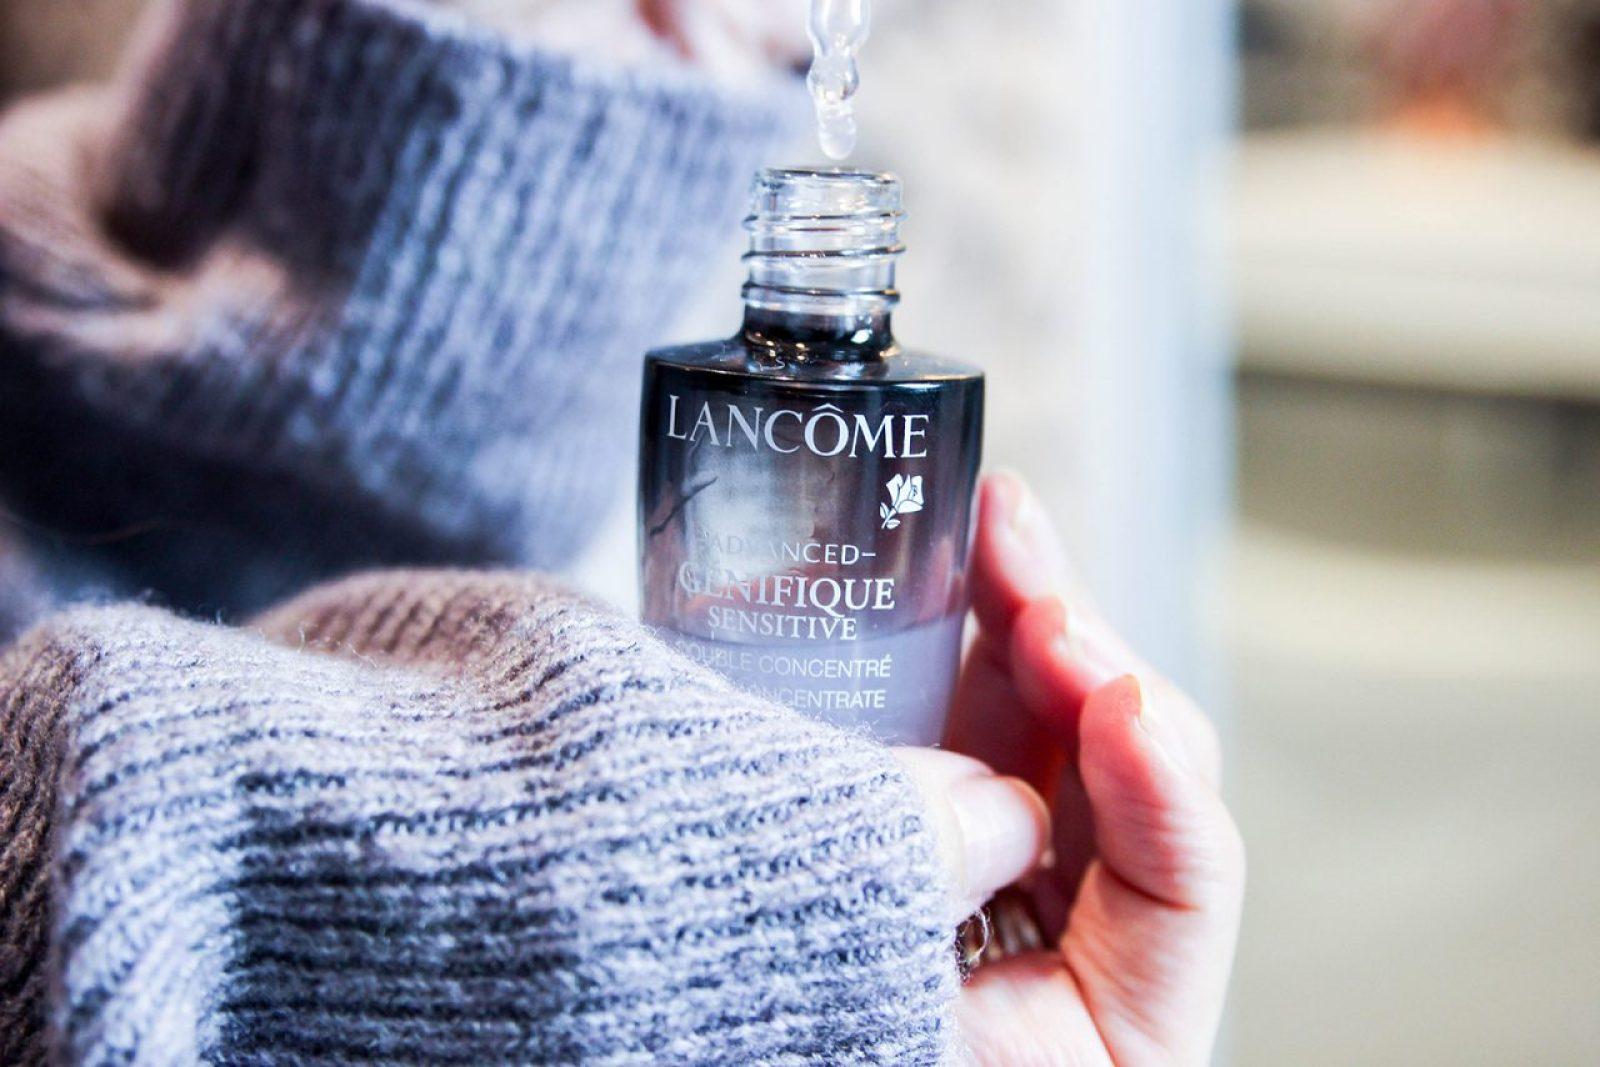 lancome-Serum-Genifique Sensitive-5